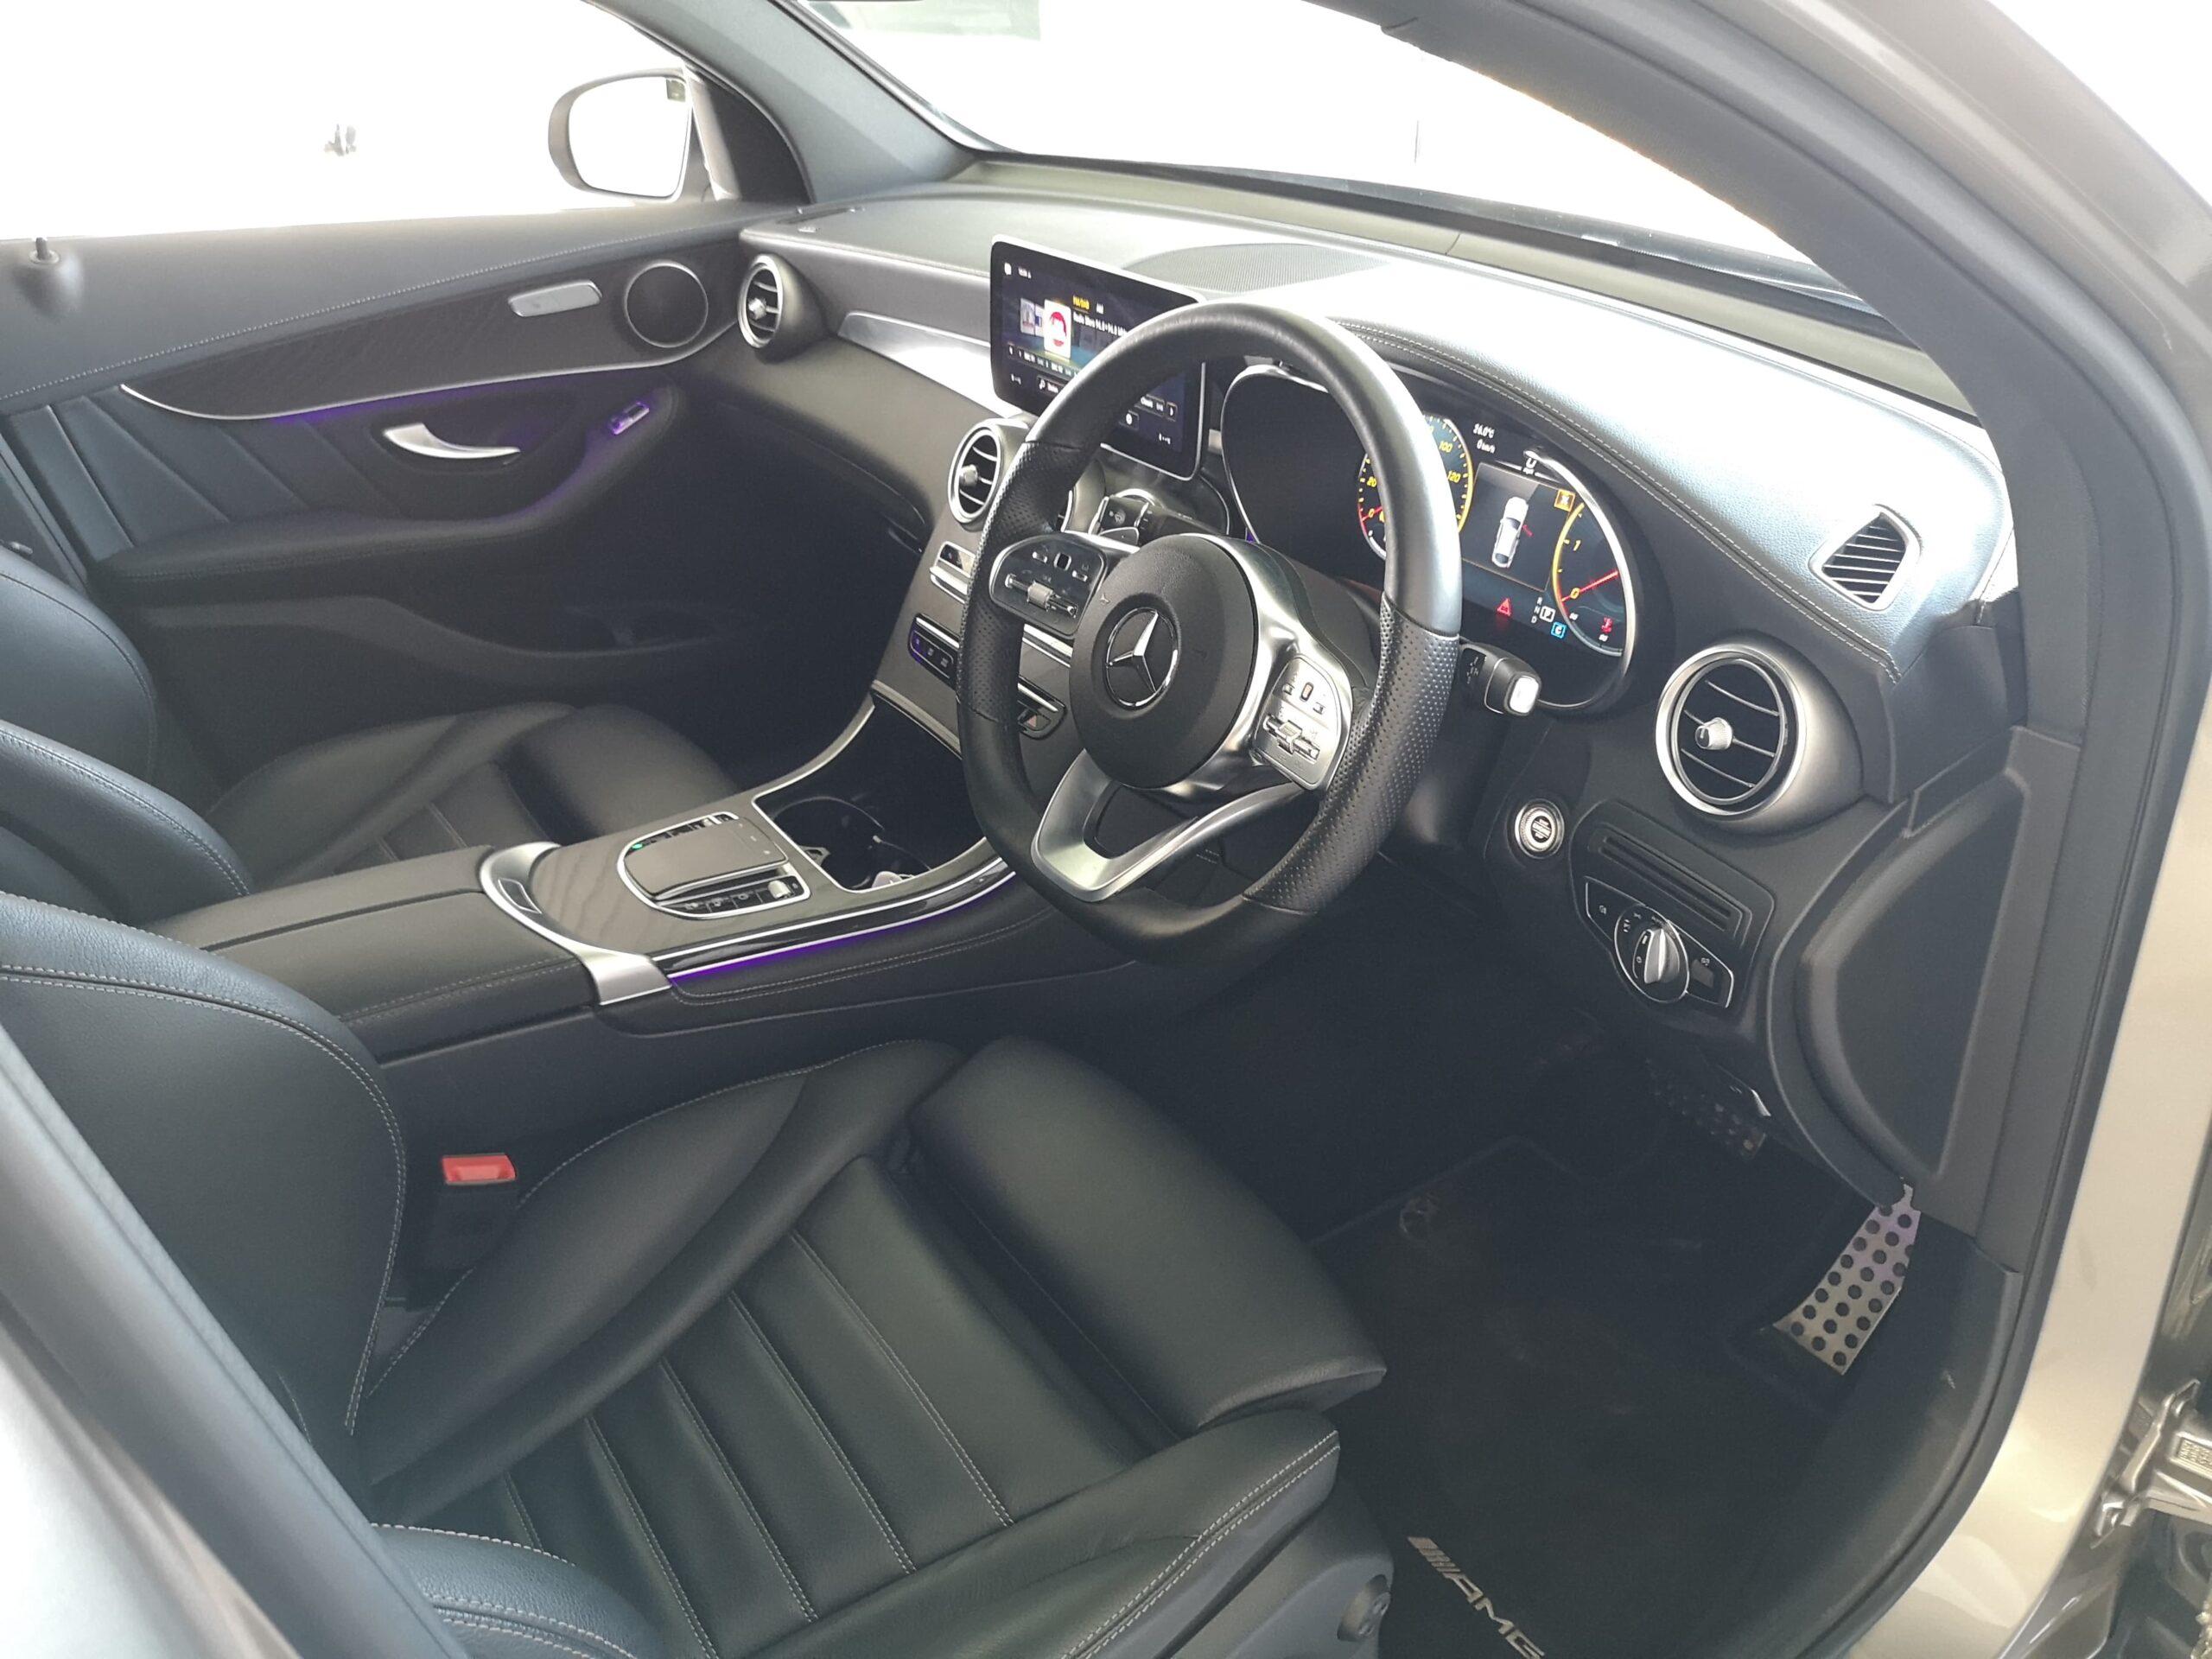 MERCEDES-BENZ GLC 300 D  AMG LINE PREMIUM 4M 9G Coupe